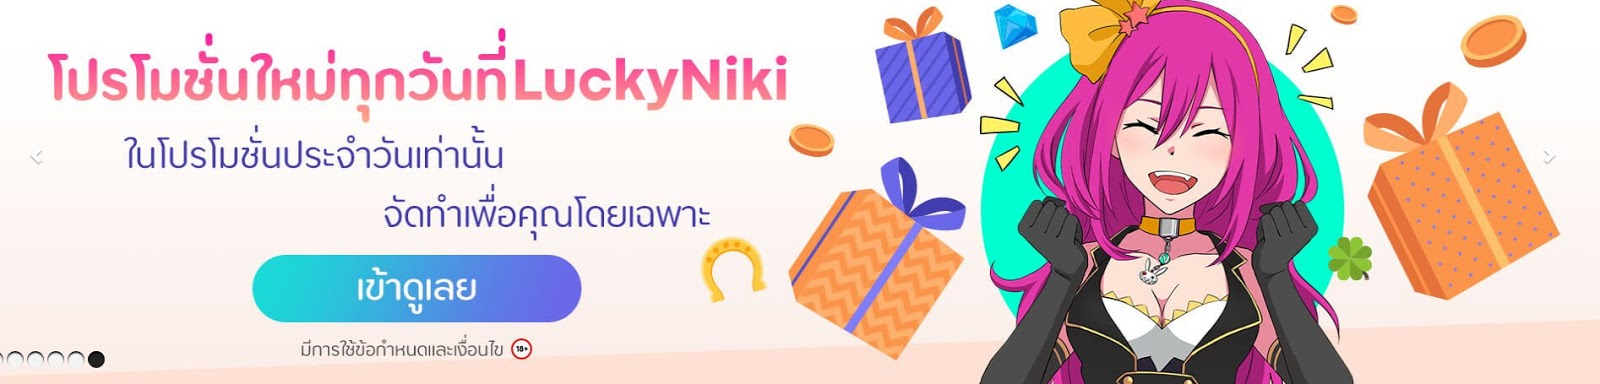 LUCKY-Niki sport788 ซับแจ็คพ็อต